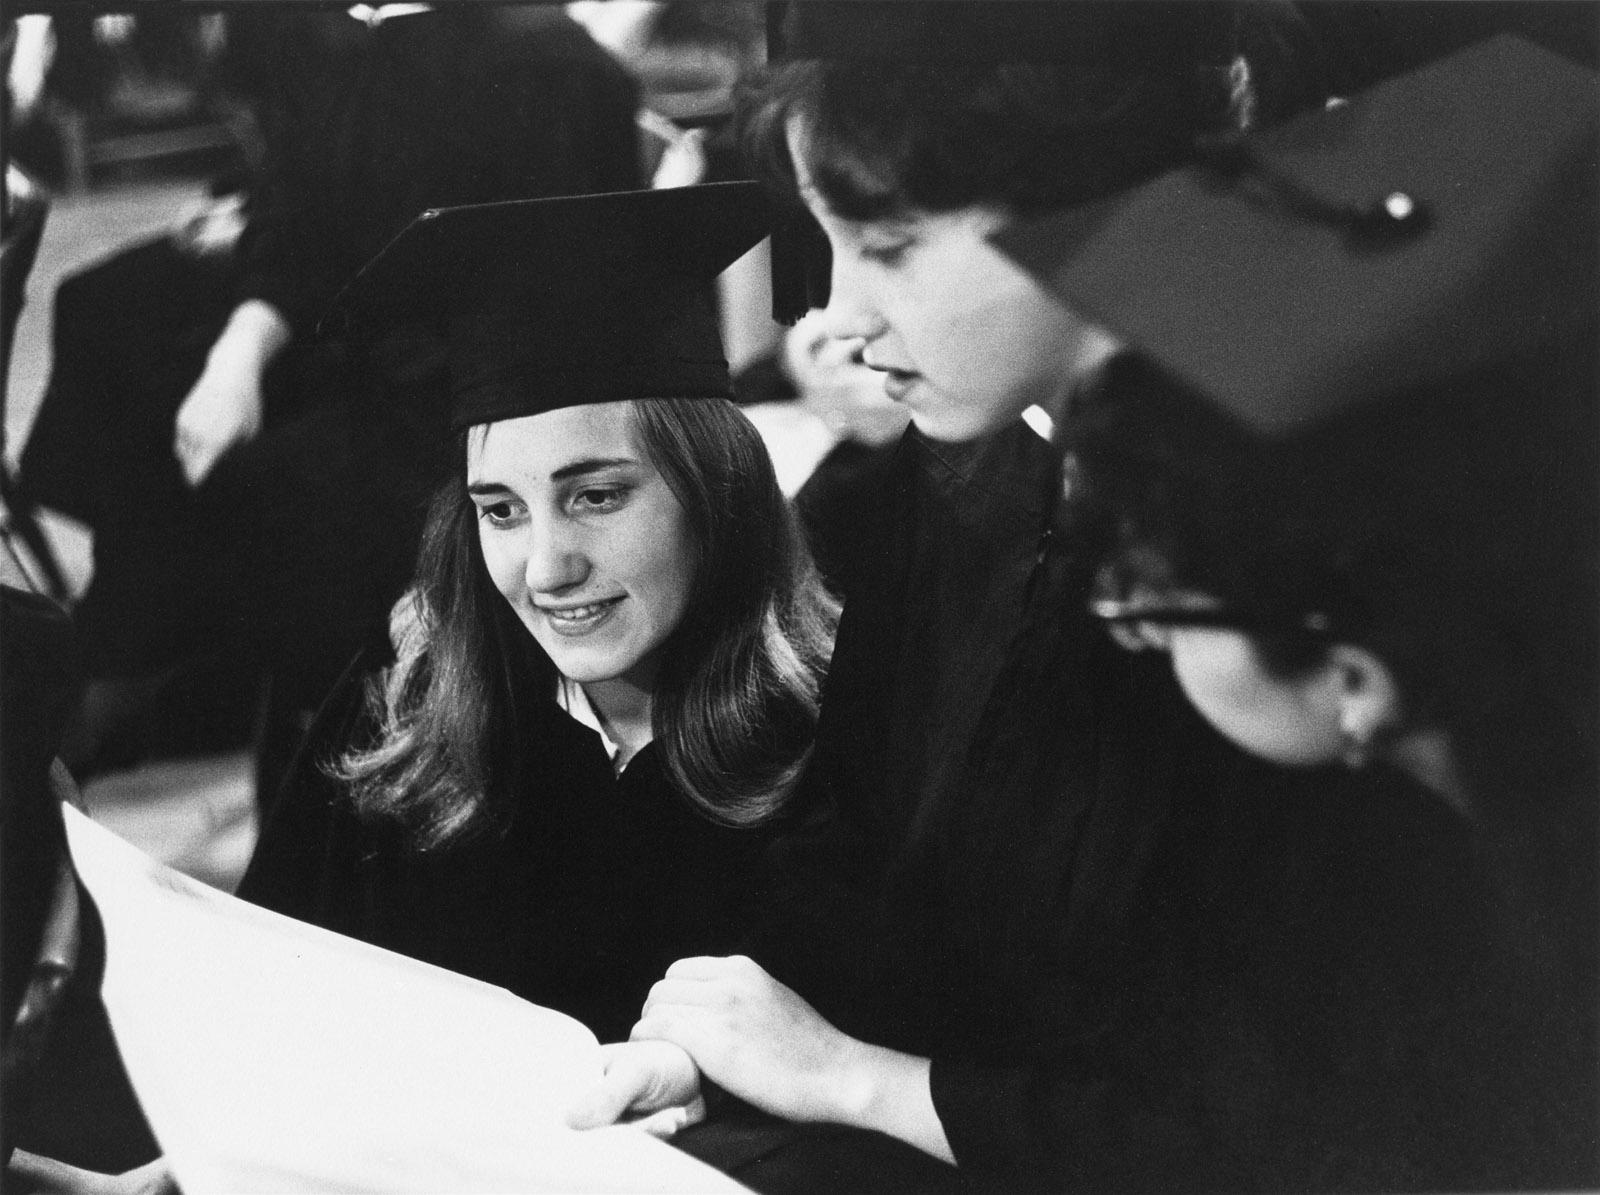 Students graduating from Radcliffe College, Cambridge, Massachusetts, June 1962